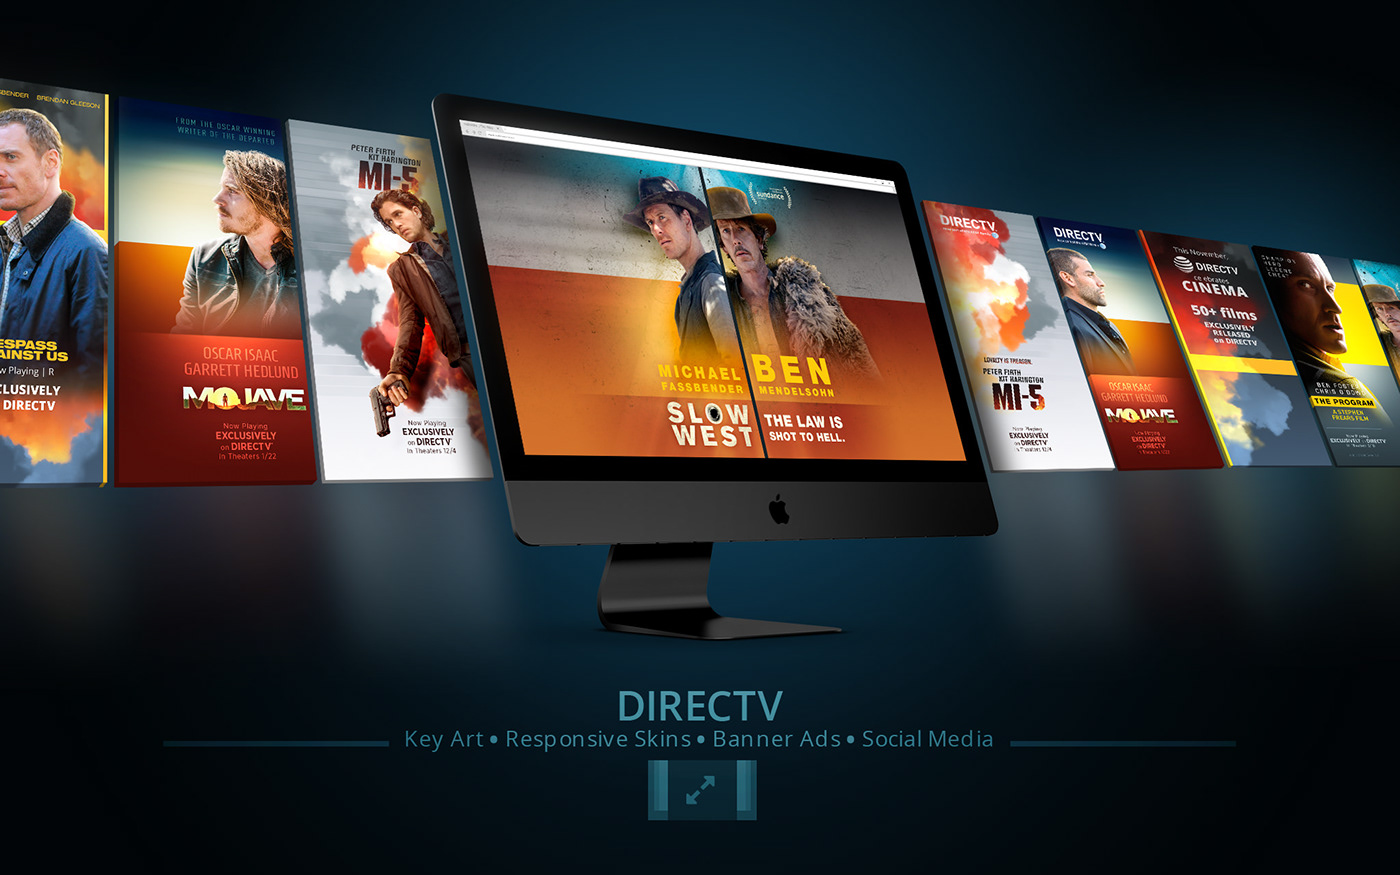 DirecTV Cinema banner ads slow west mojave MI-5 the program Tresspass Against Us key art social media